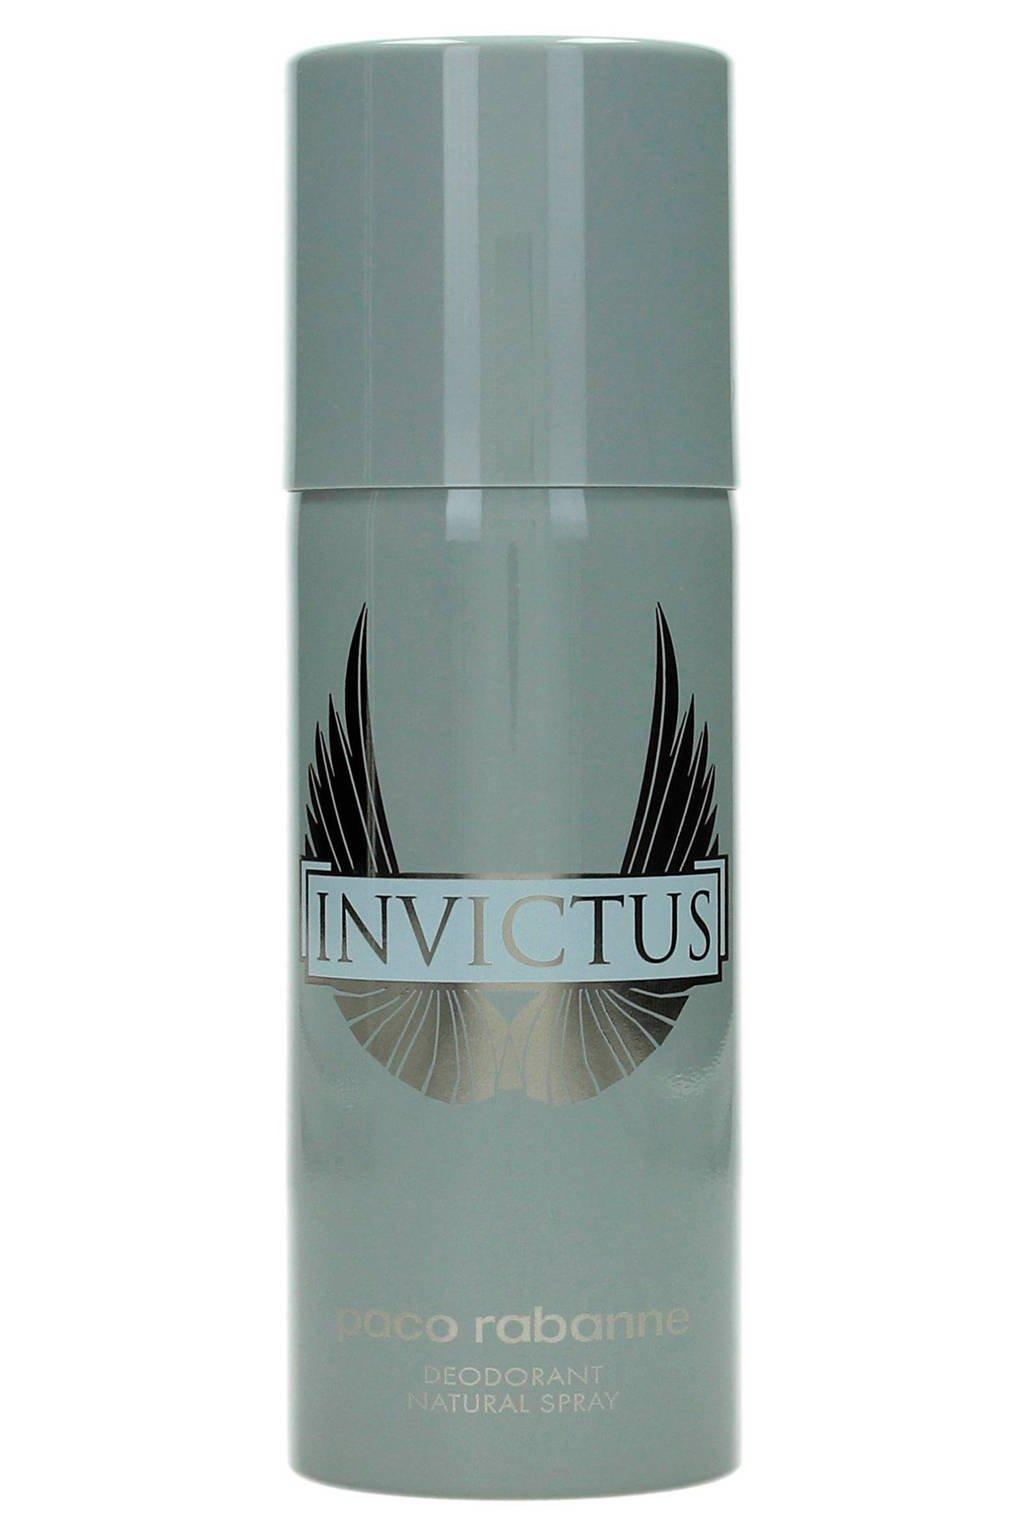 Paco Rabanne Invictus deodorant spray - 150 ml